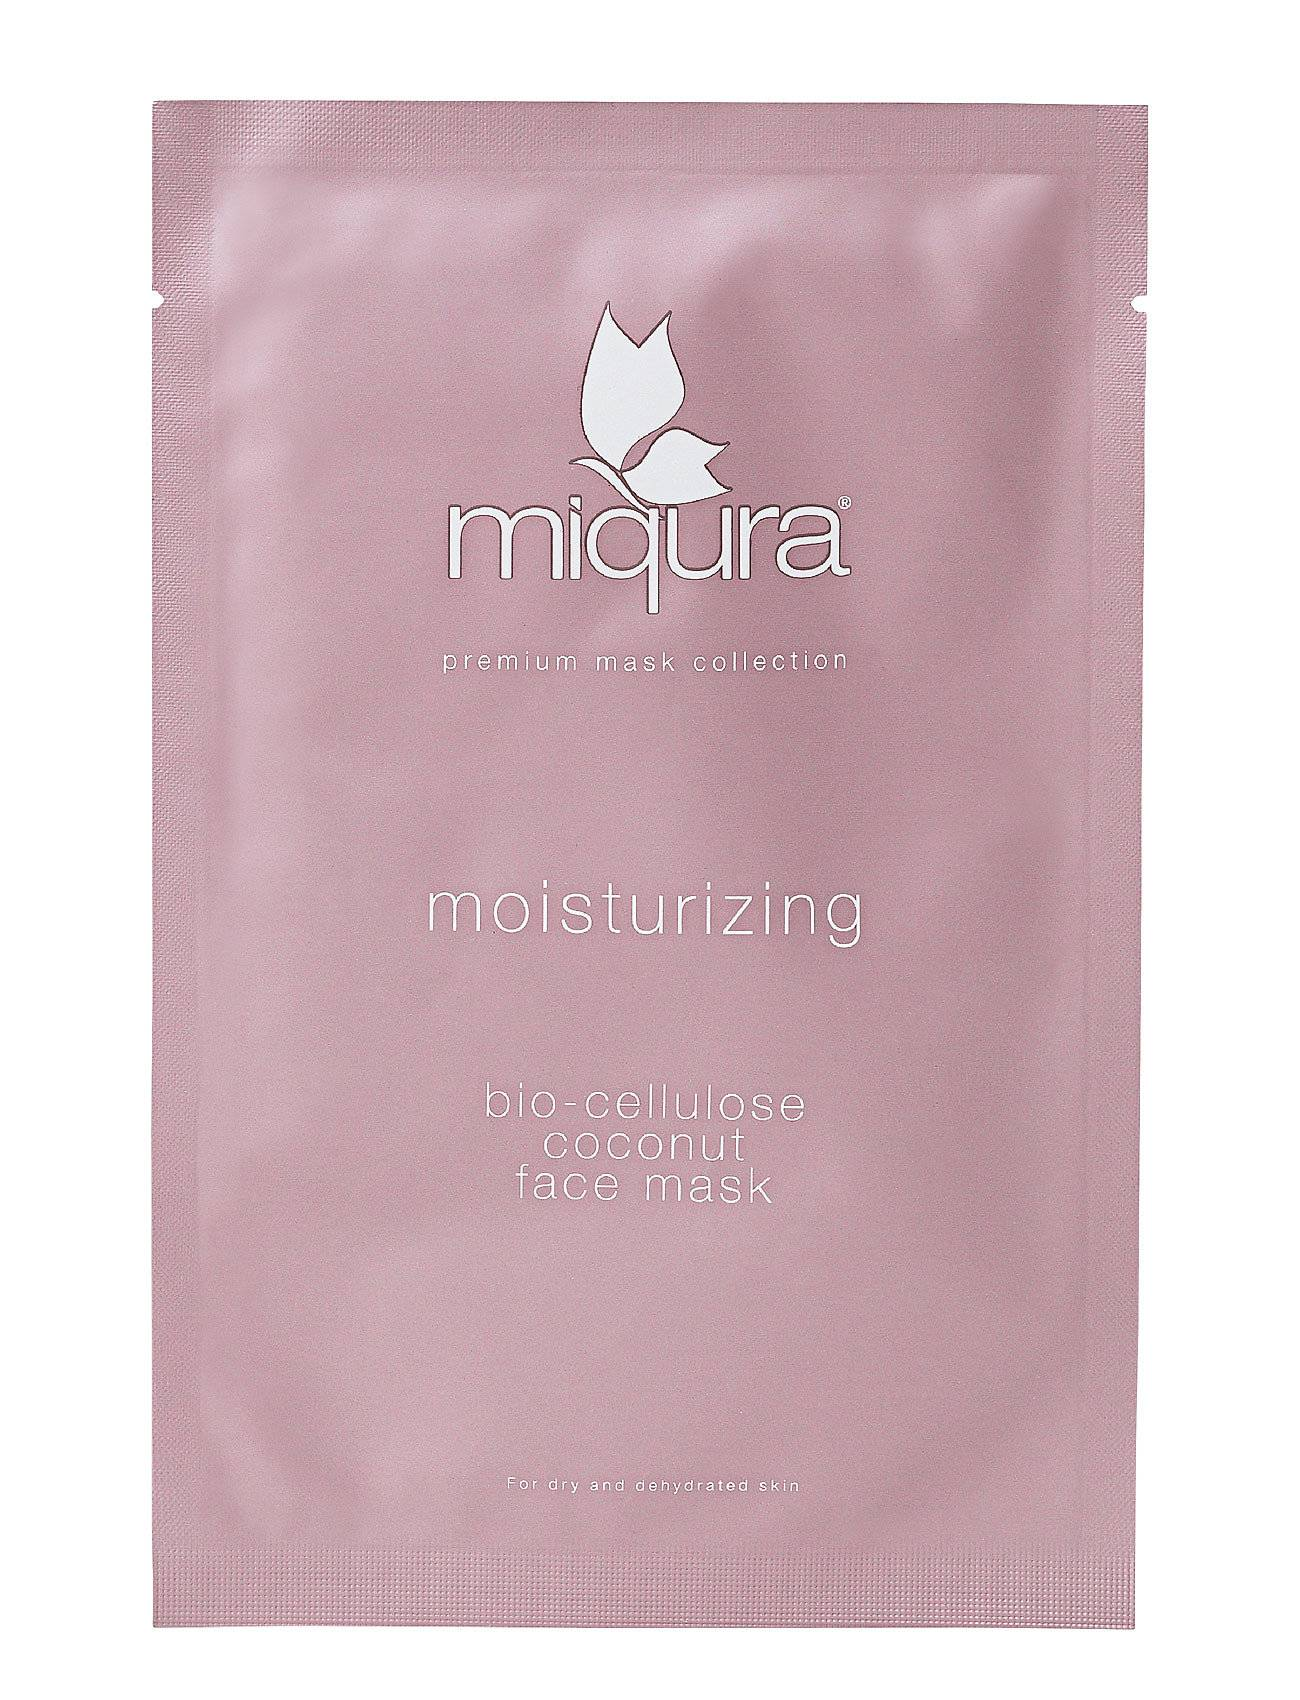 Miqura Moisturizing Bio Cellulose Sheet Mask Beauty WOMEN Skin Care Face Sheet Mask Nude Miqura